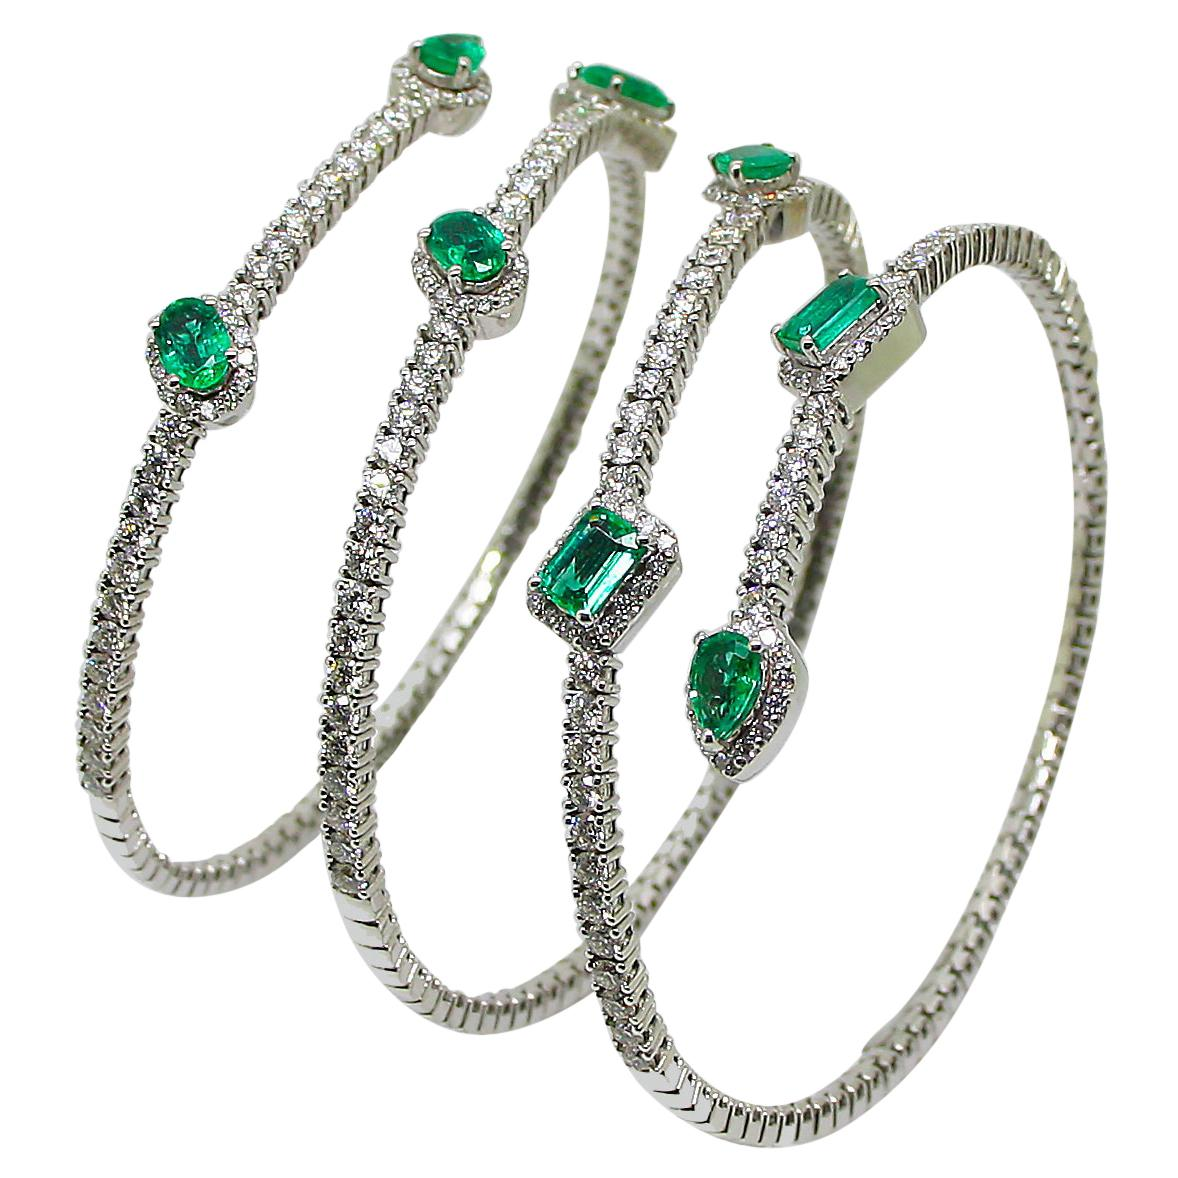 Georgios Collections 18 Karat White Gold Diamond Emerald Wrap Wide Cuff Bracelet